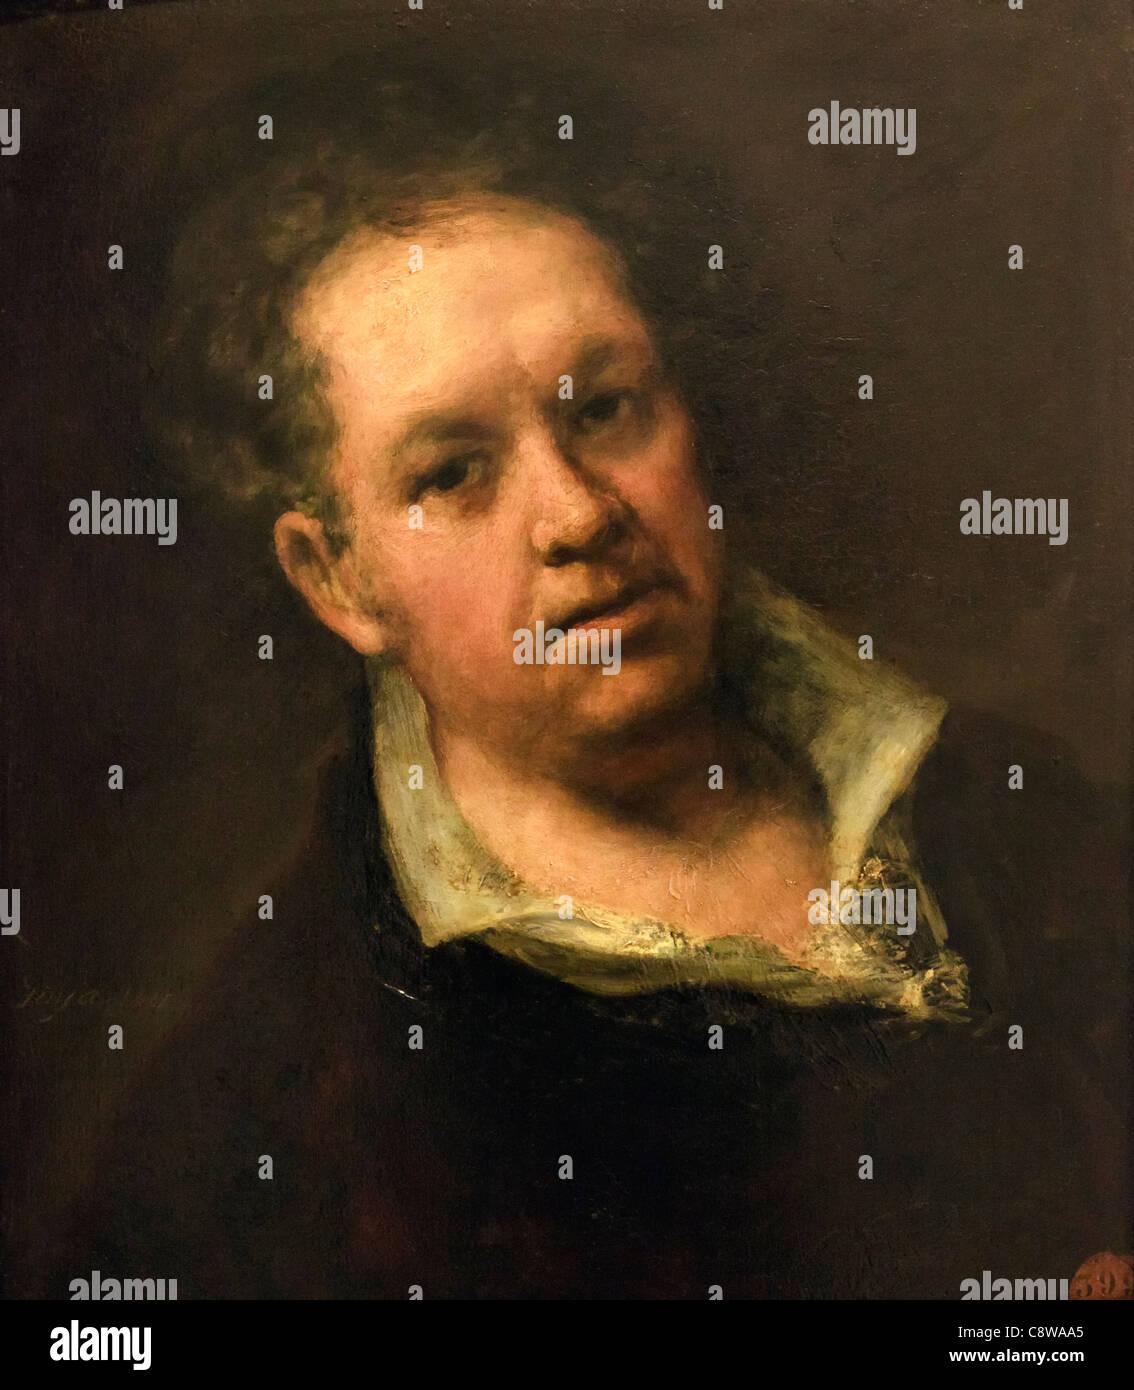 Self-portrait. Francisco Goya at 69 years of age. Francisco José de Goya y Lucientes, 1746 – 1828. Spanish - Stock Image